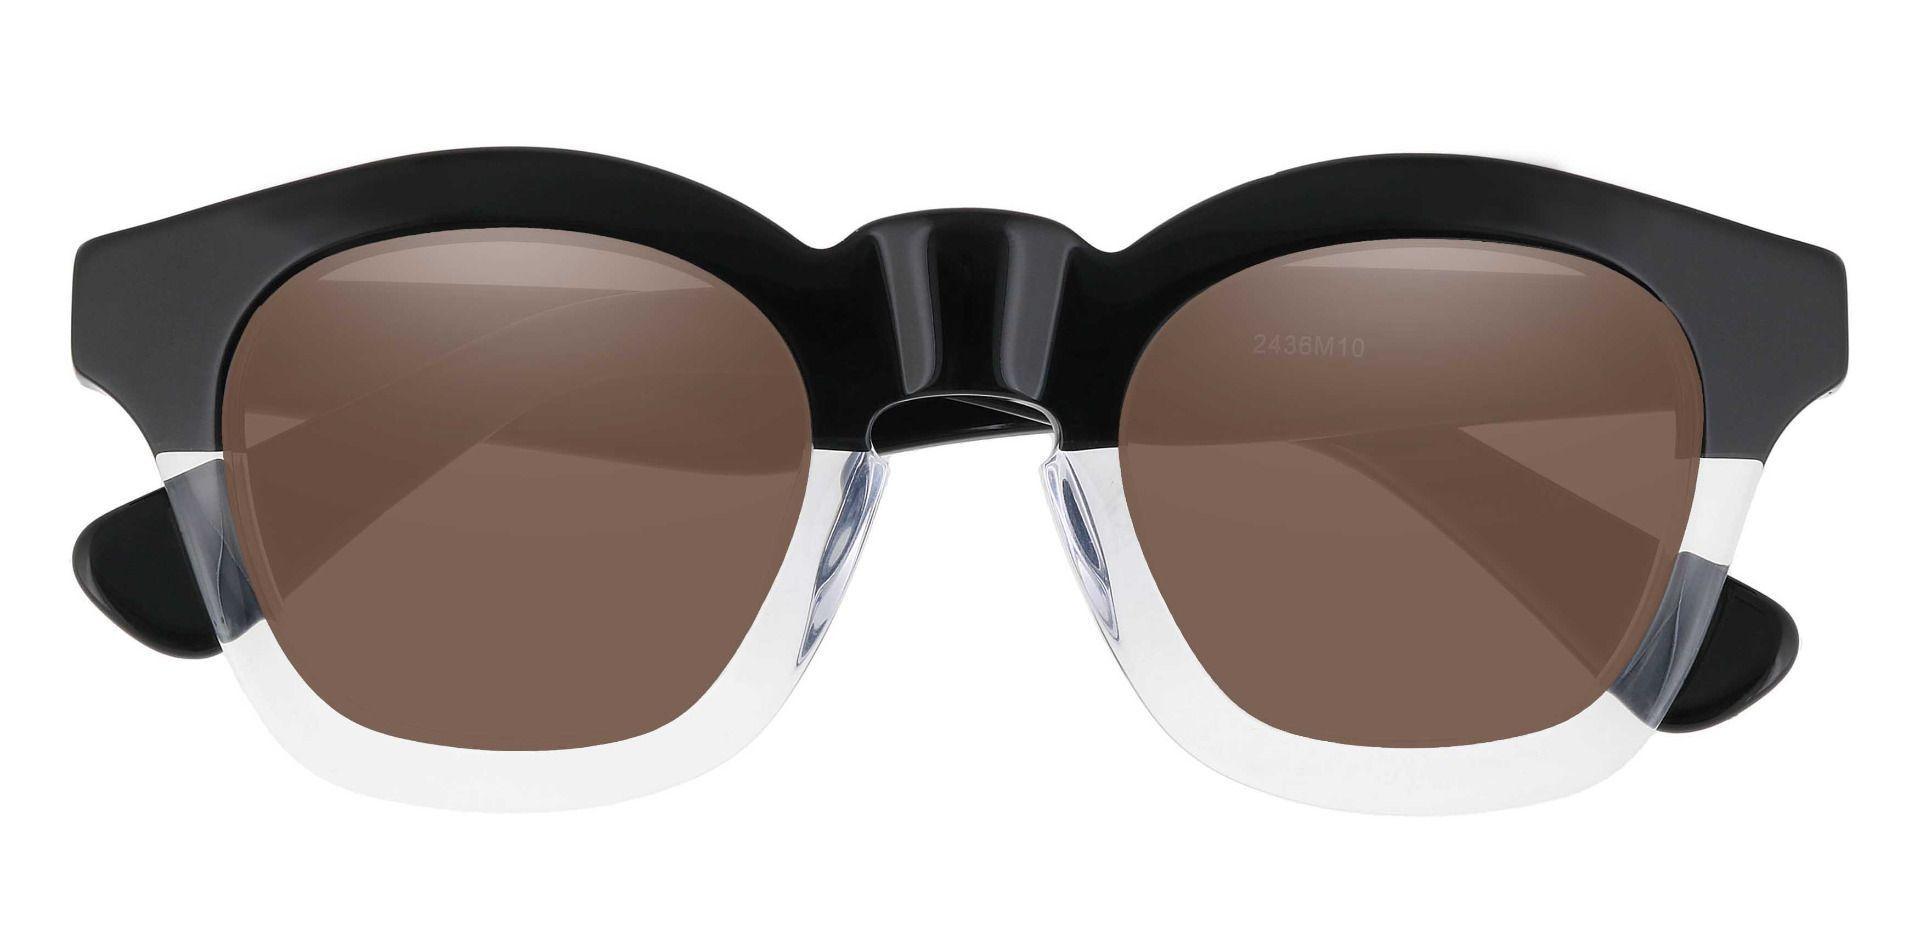 Bolton Square Prescription Sunglasses - Clear Frame With Brown Lenses